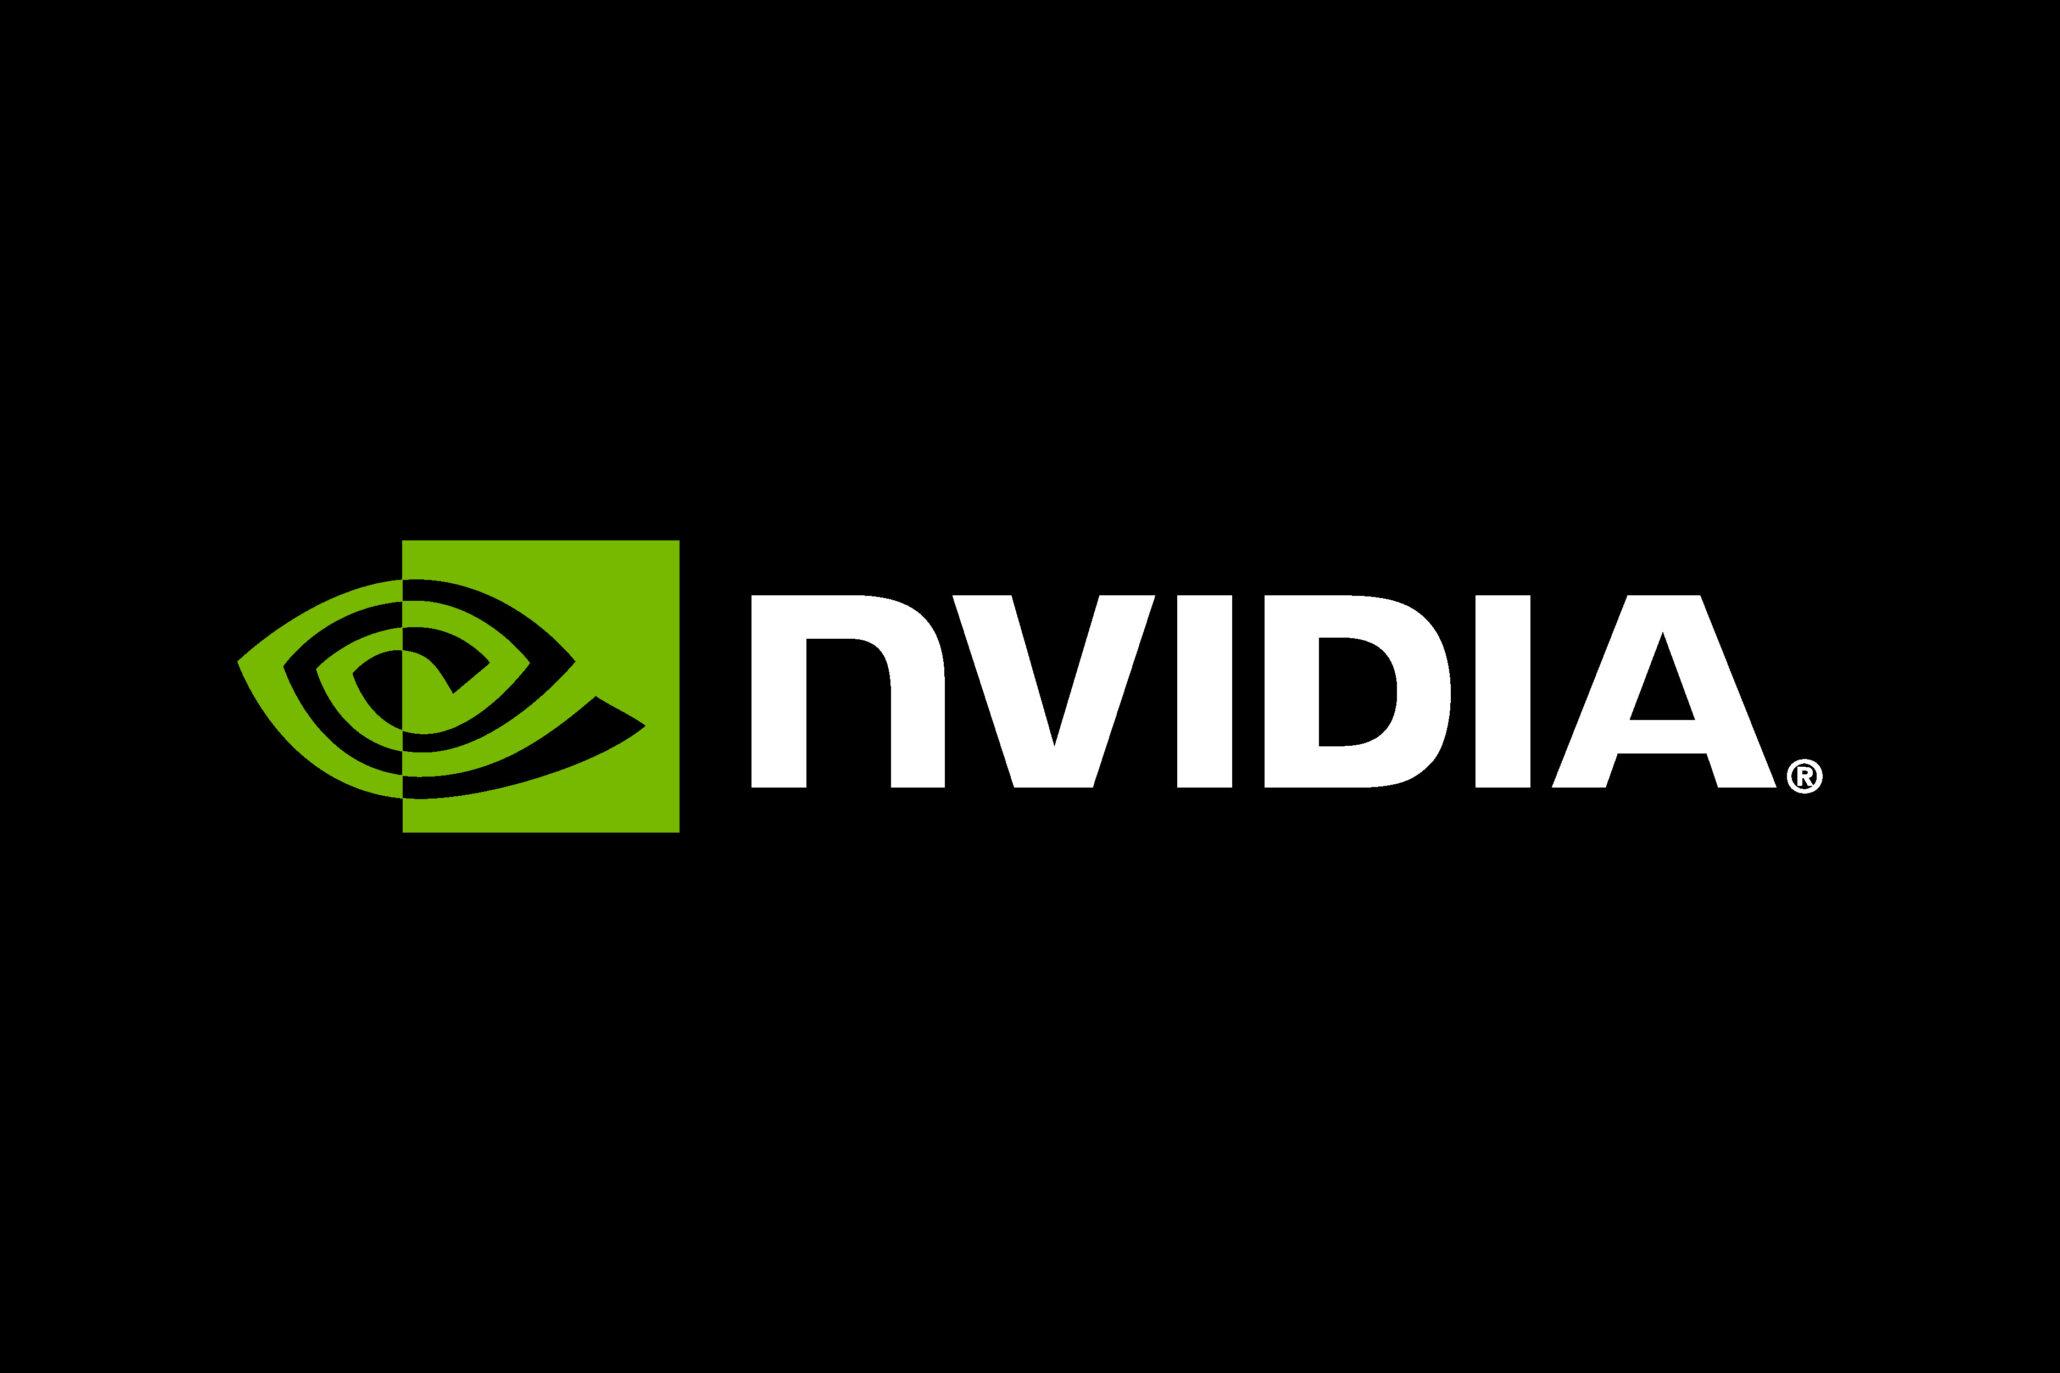 Best Gaming Gpu 2021 NVIDIA Q2 2021 Earnings – Data Center Segment Shines Brighter than